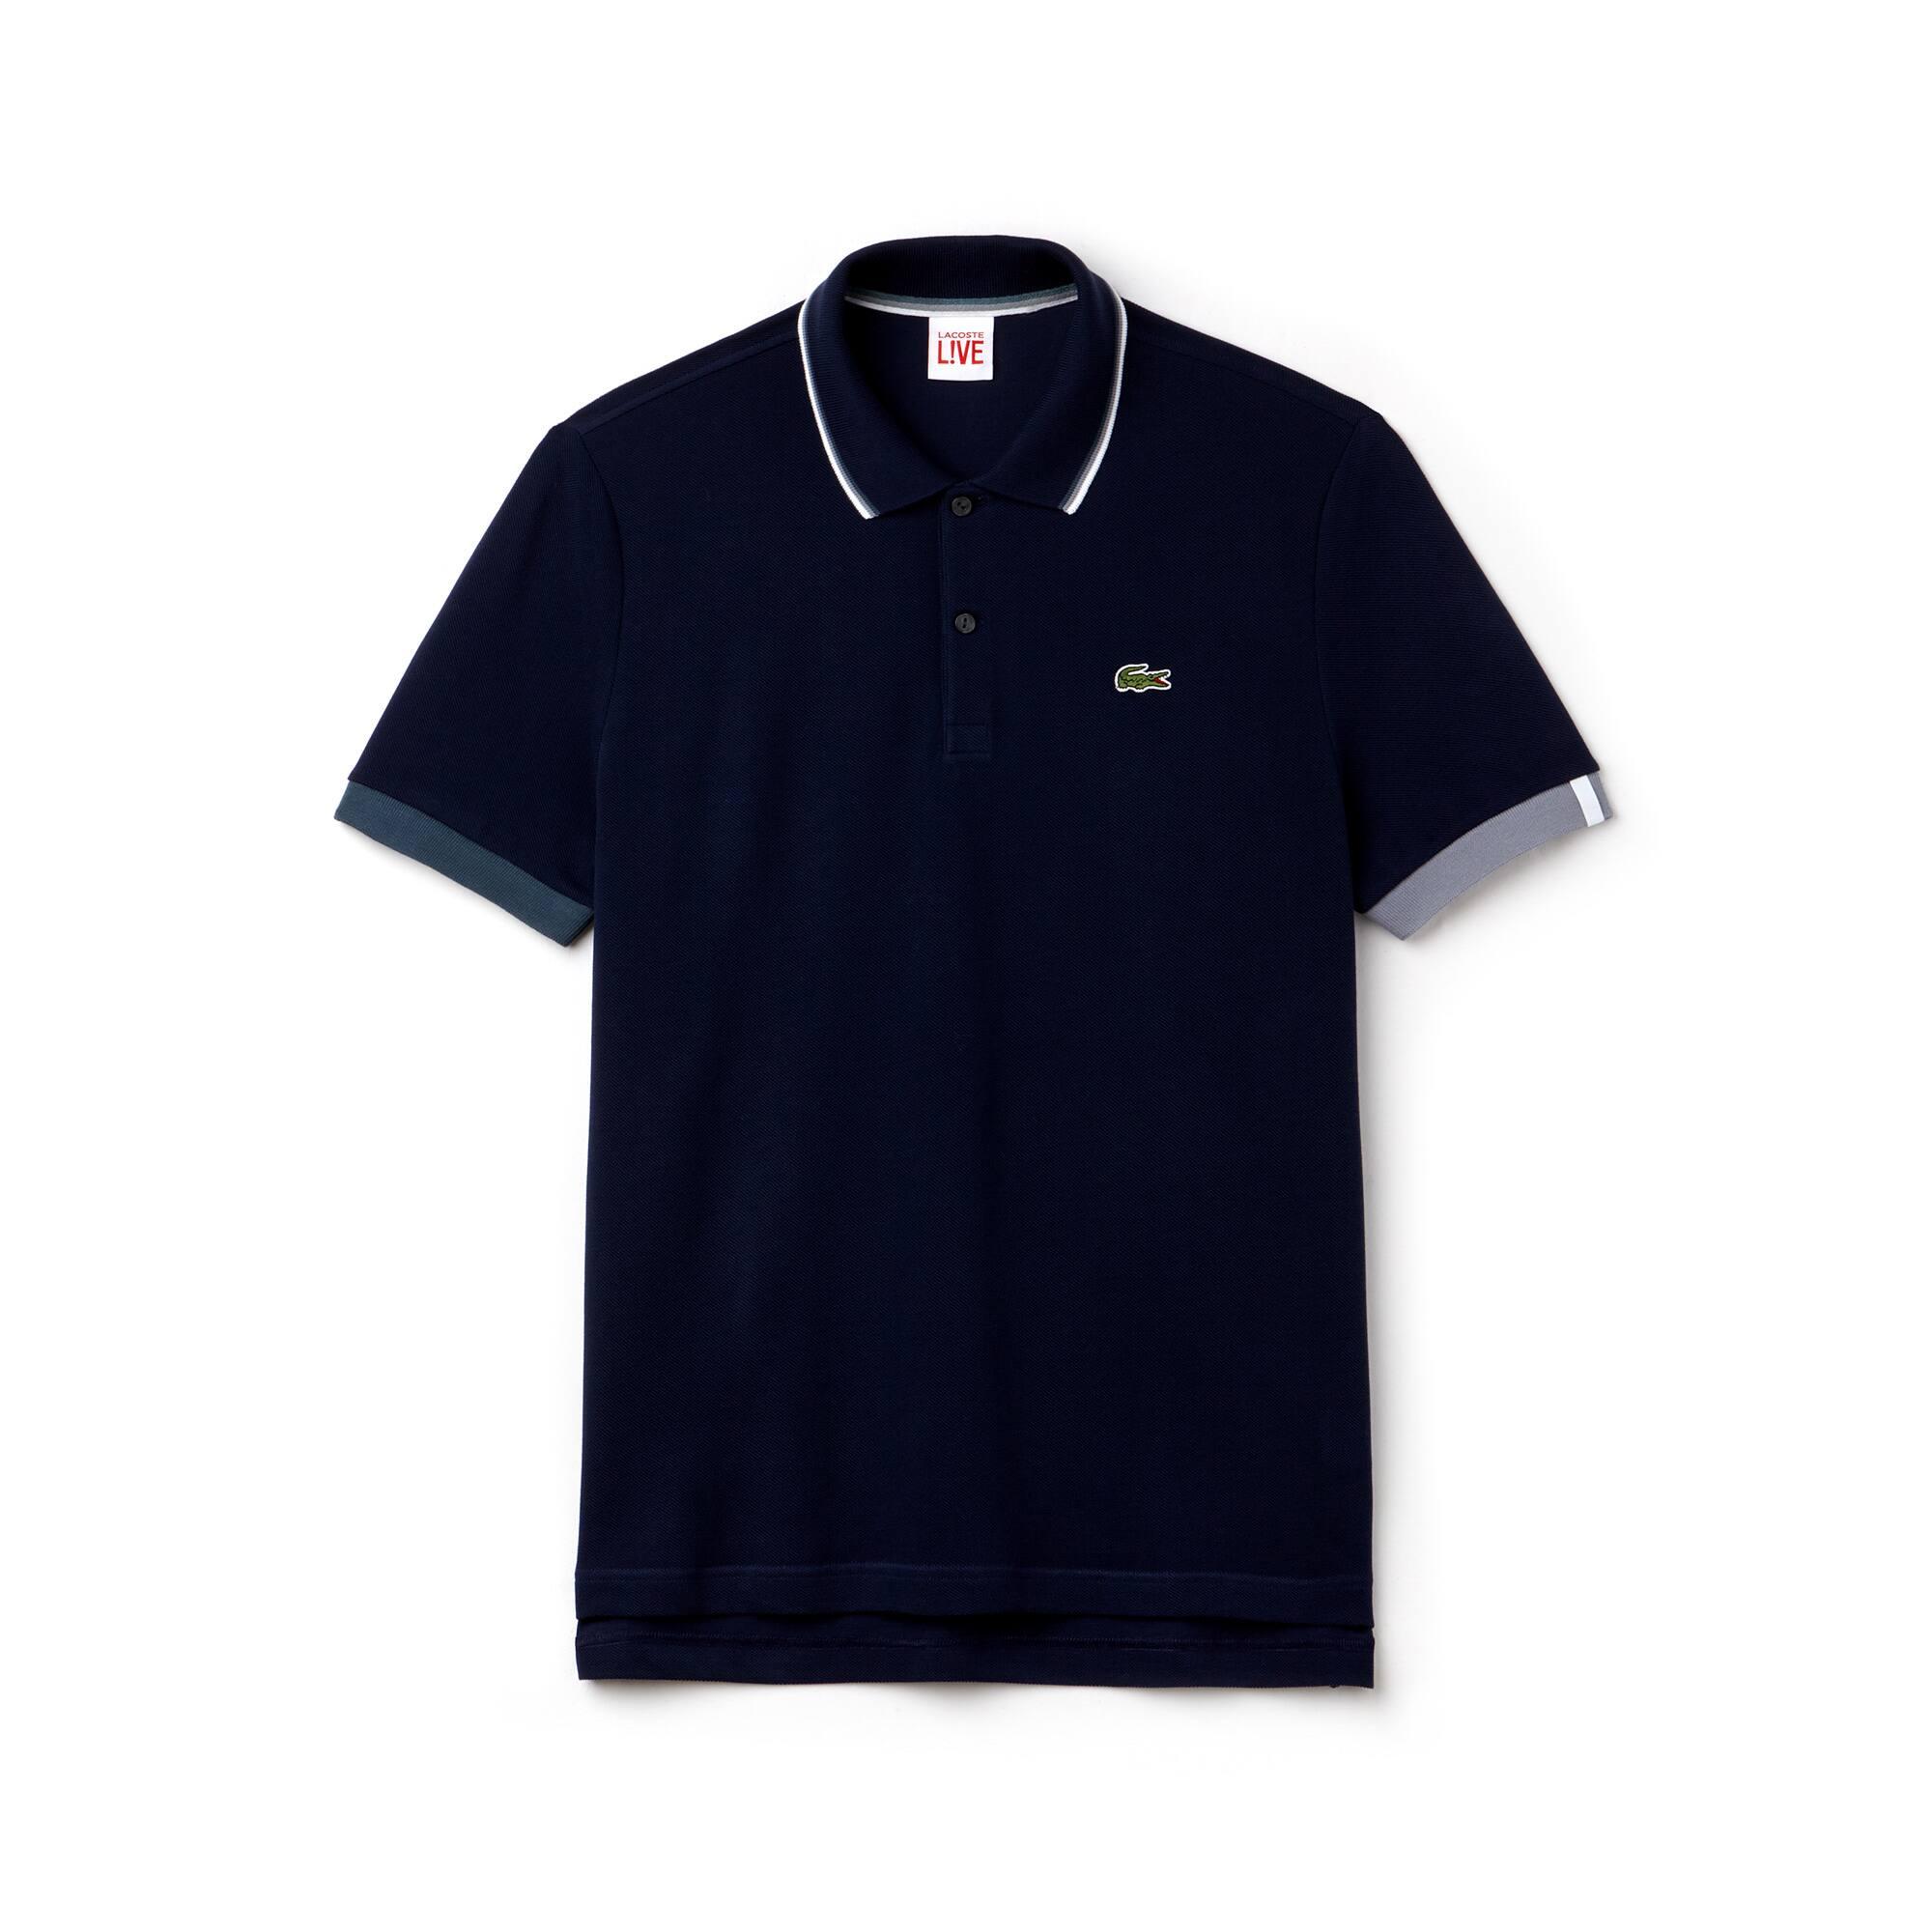 953984f69cb Camisa Polo Lacoste LIVE Slim Fit Masculina em Petit Piqué com Gola Debruada